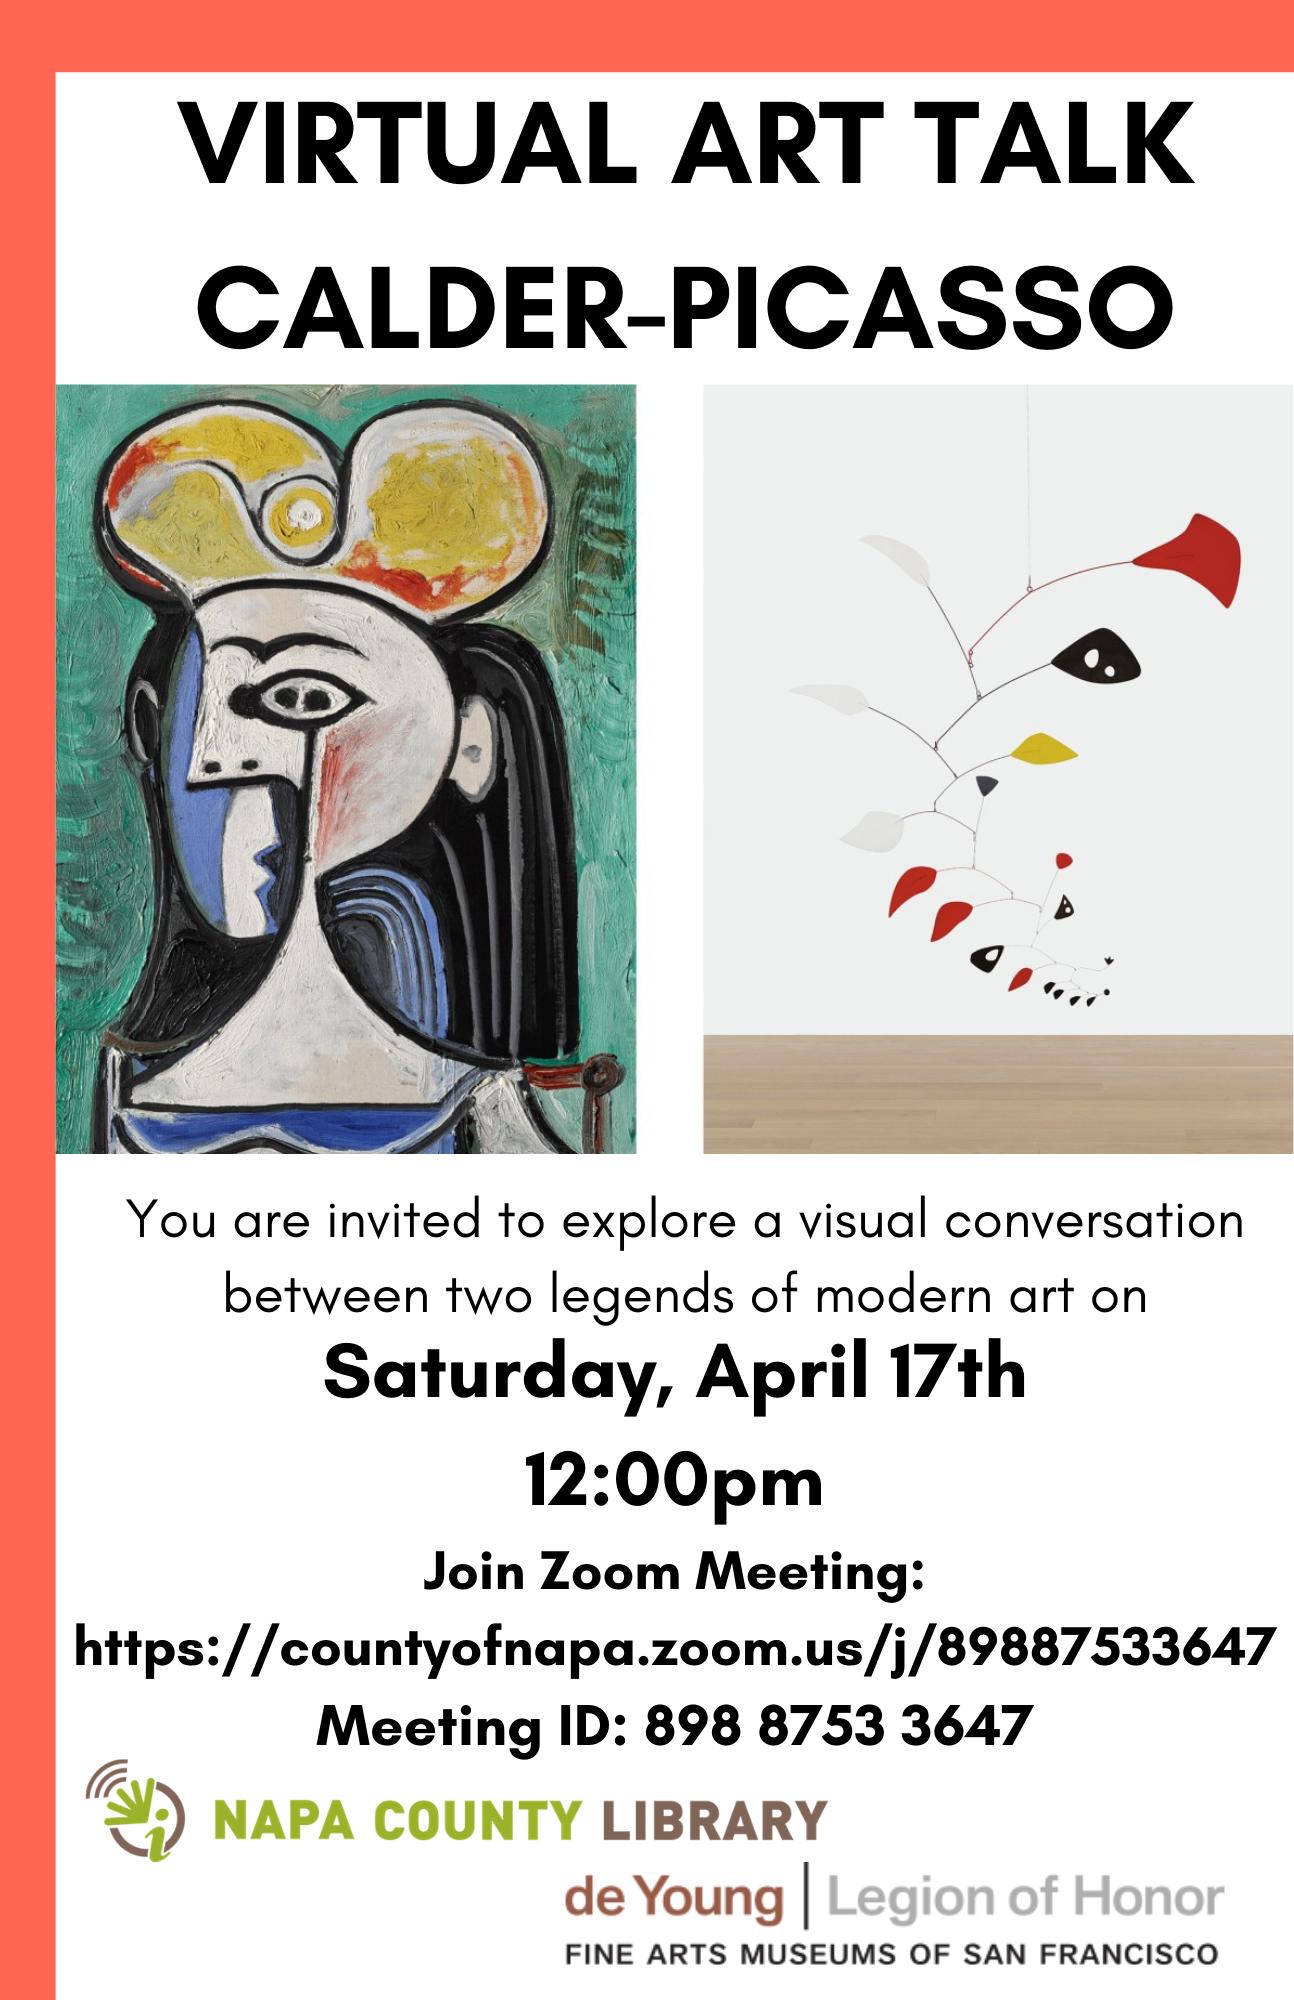 Virtual Art Talk: Calder-Picasso